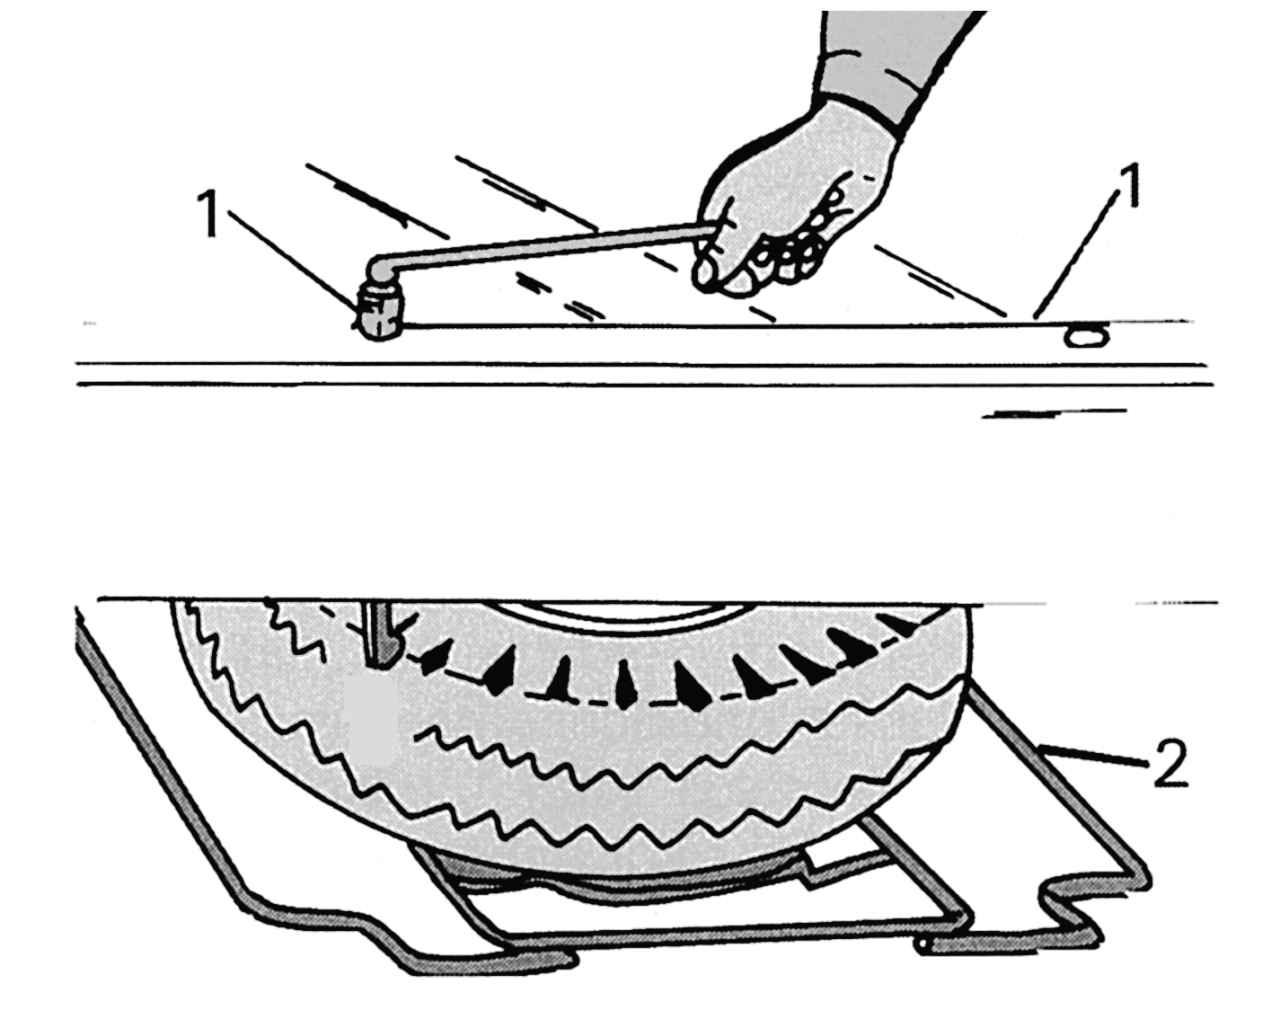 мерседес спринтер схема электрооборудования